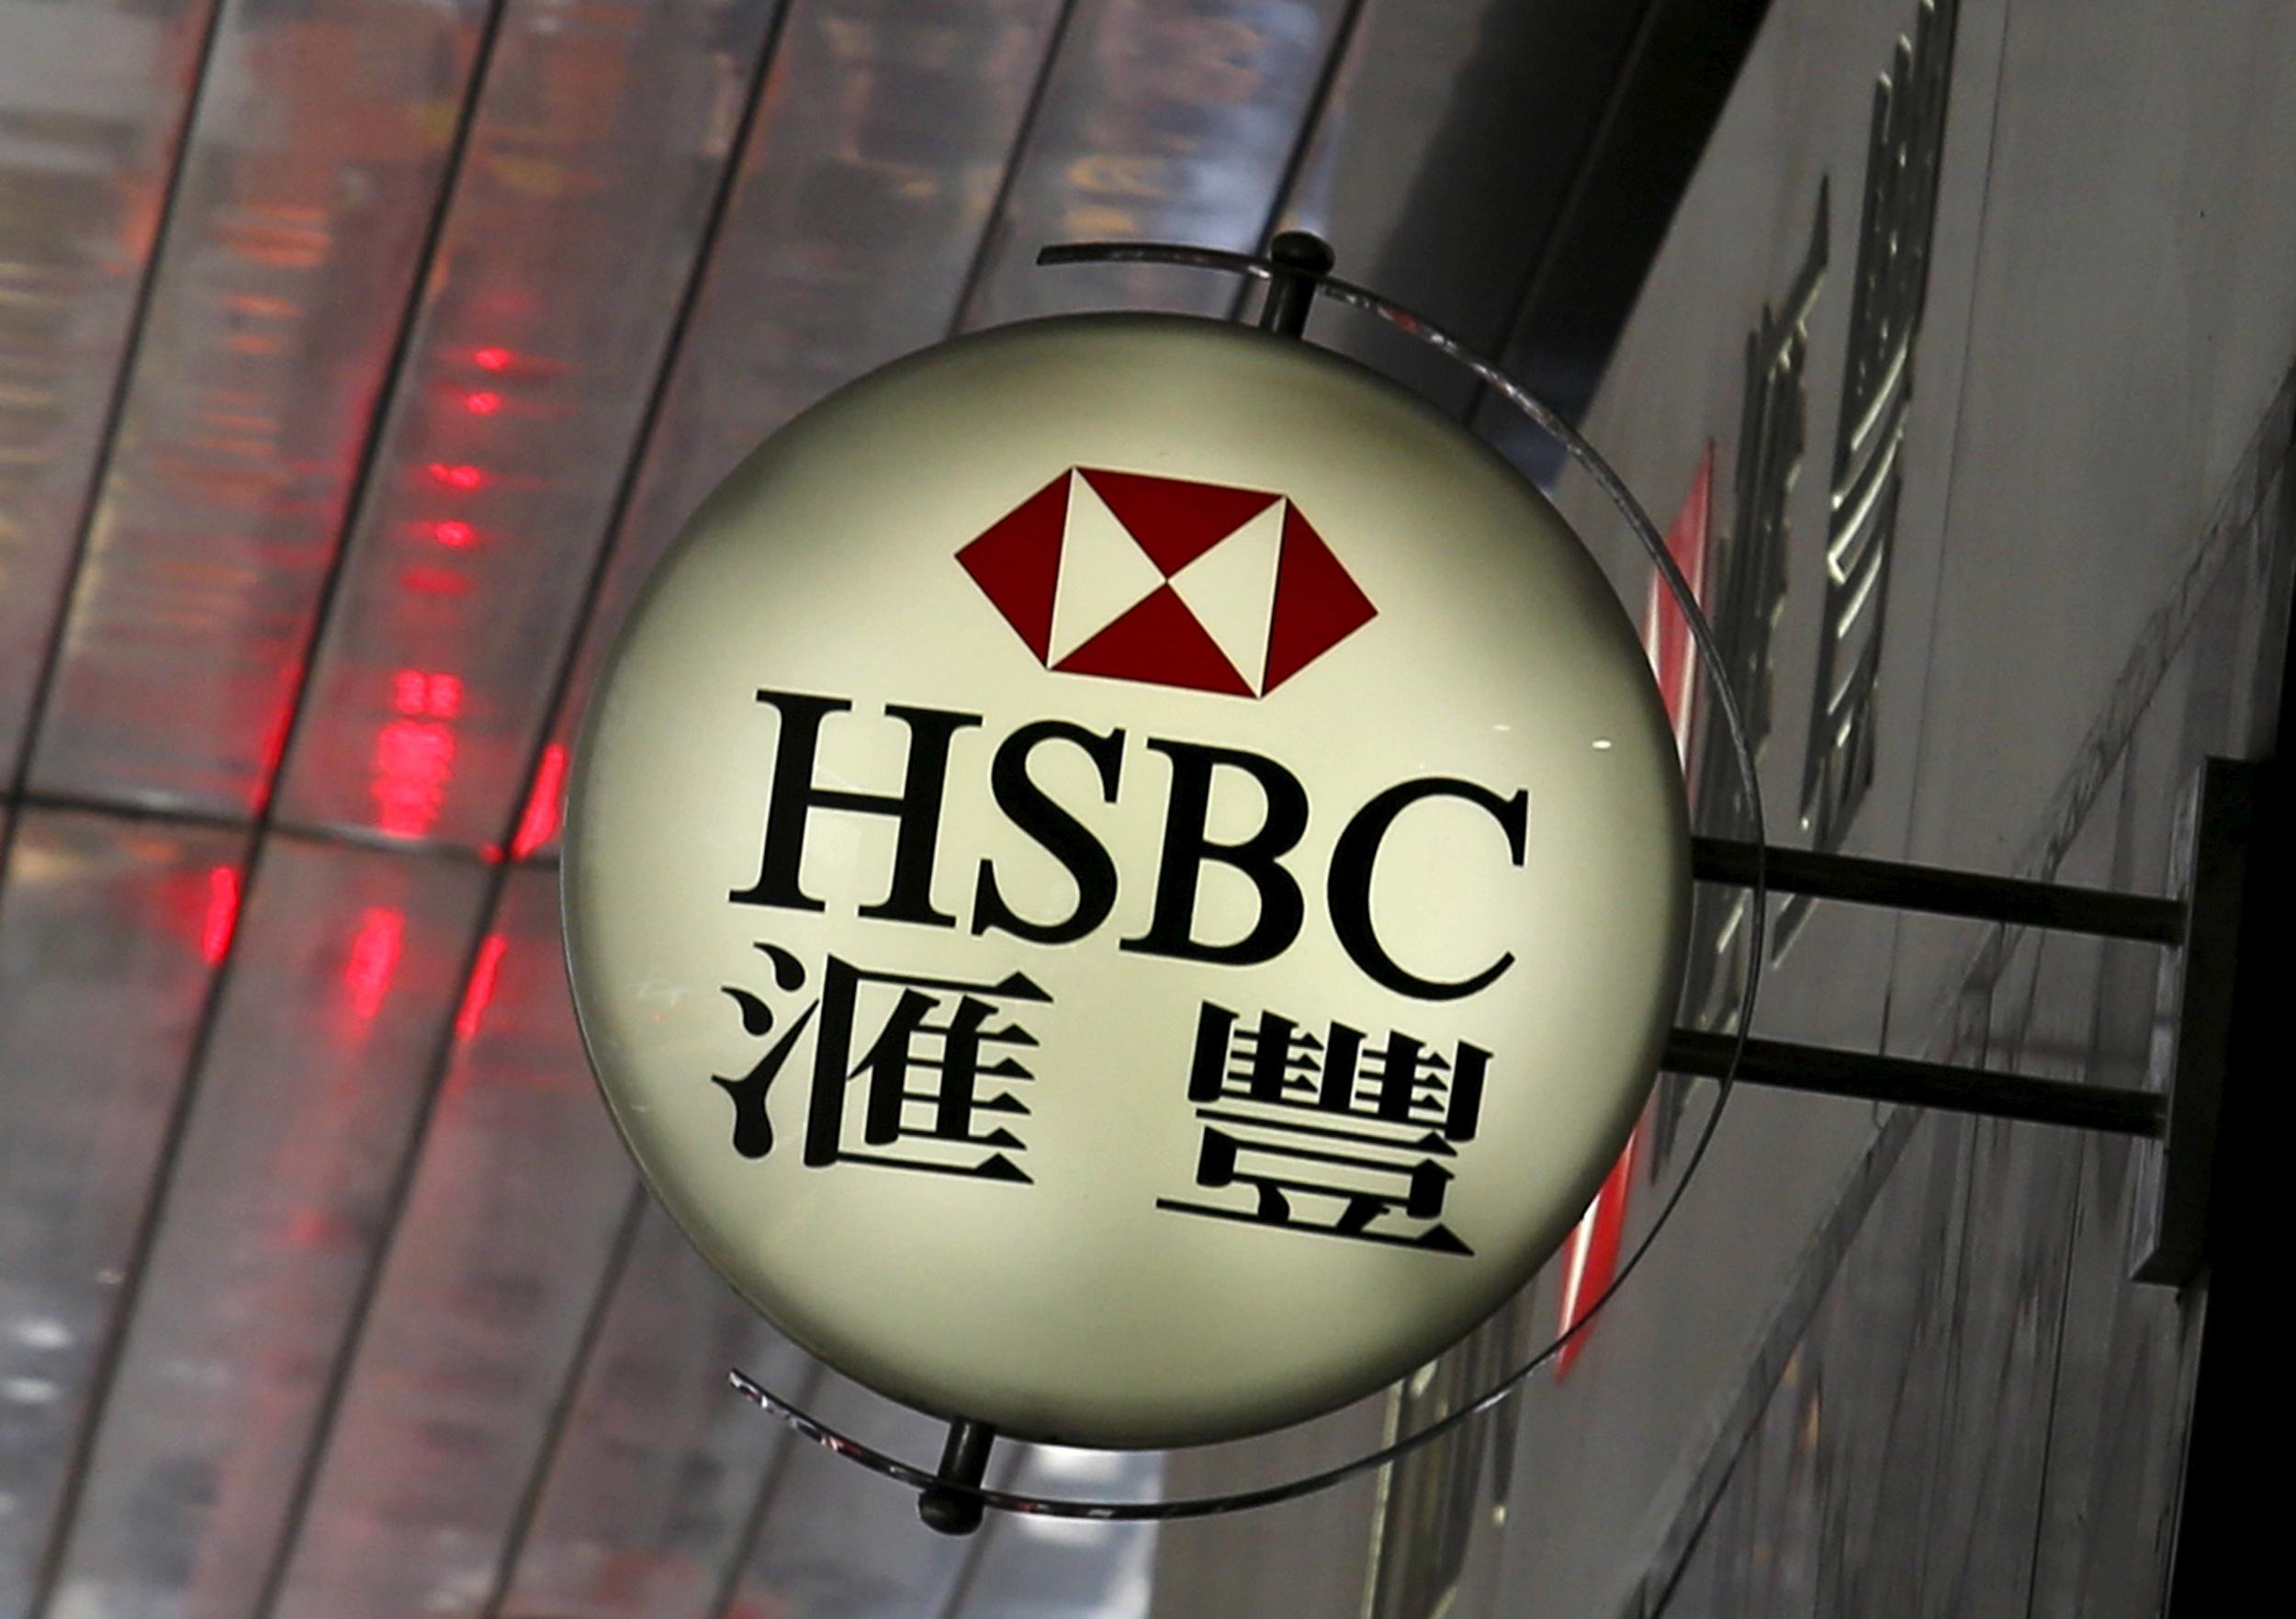 A logo of HSBC